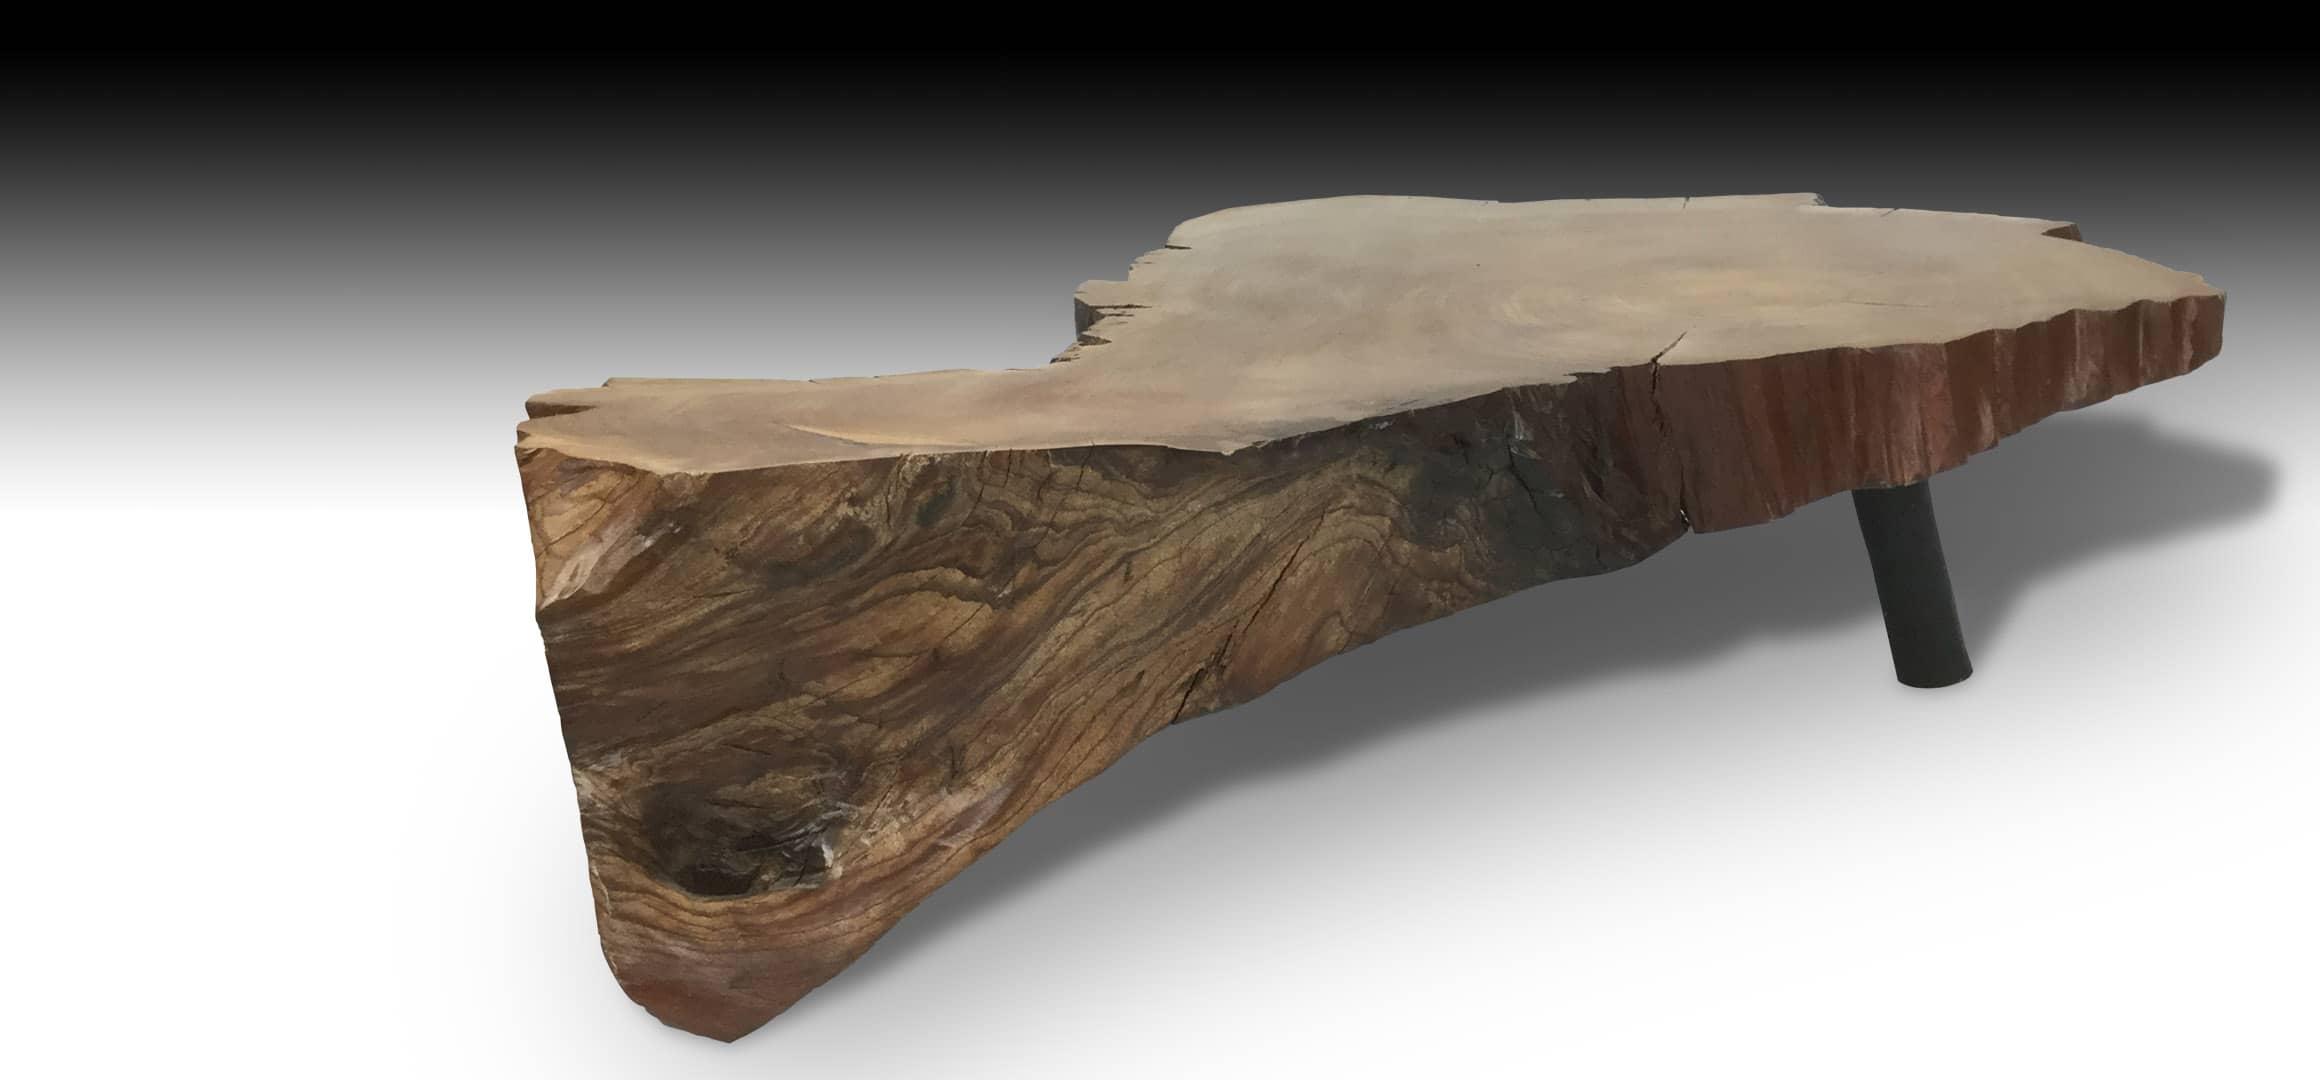 Cliff live edge Mahogany wood coffee table diagonal view 2